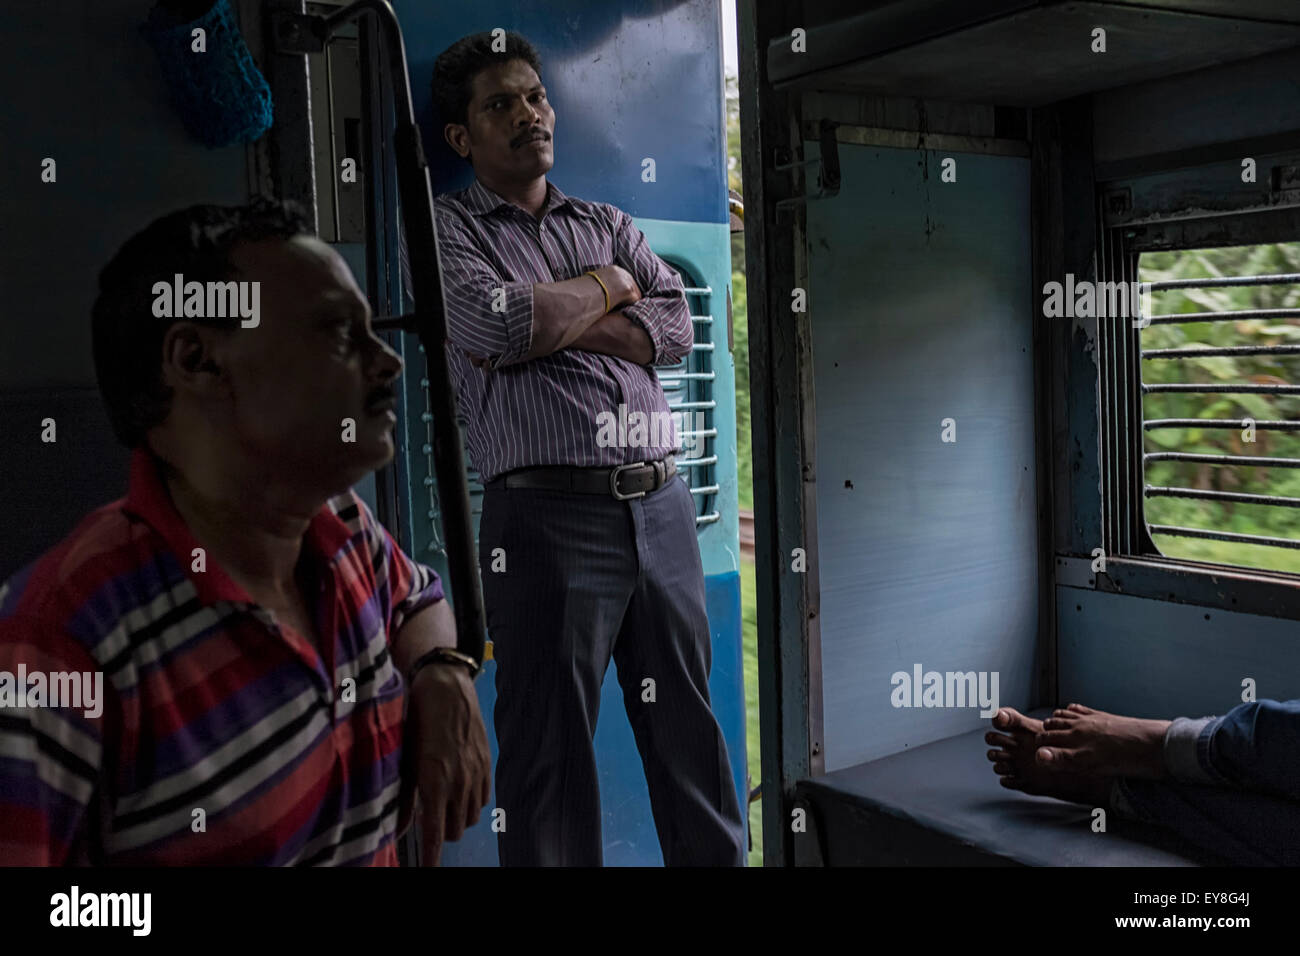 On the Netravati express, Mumbai - Trivandrum - Stock Image